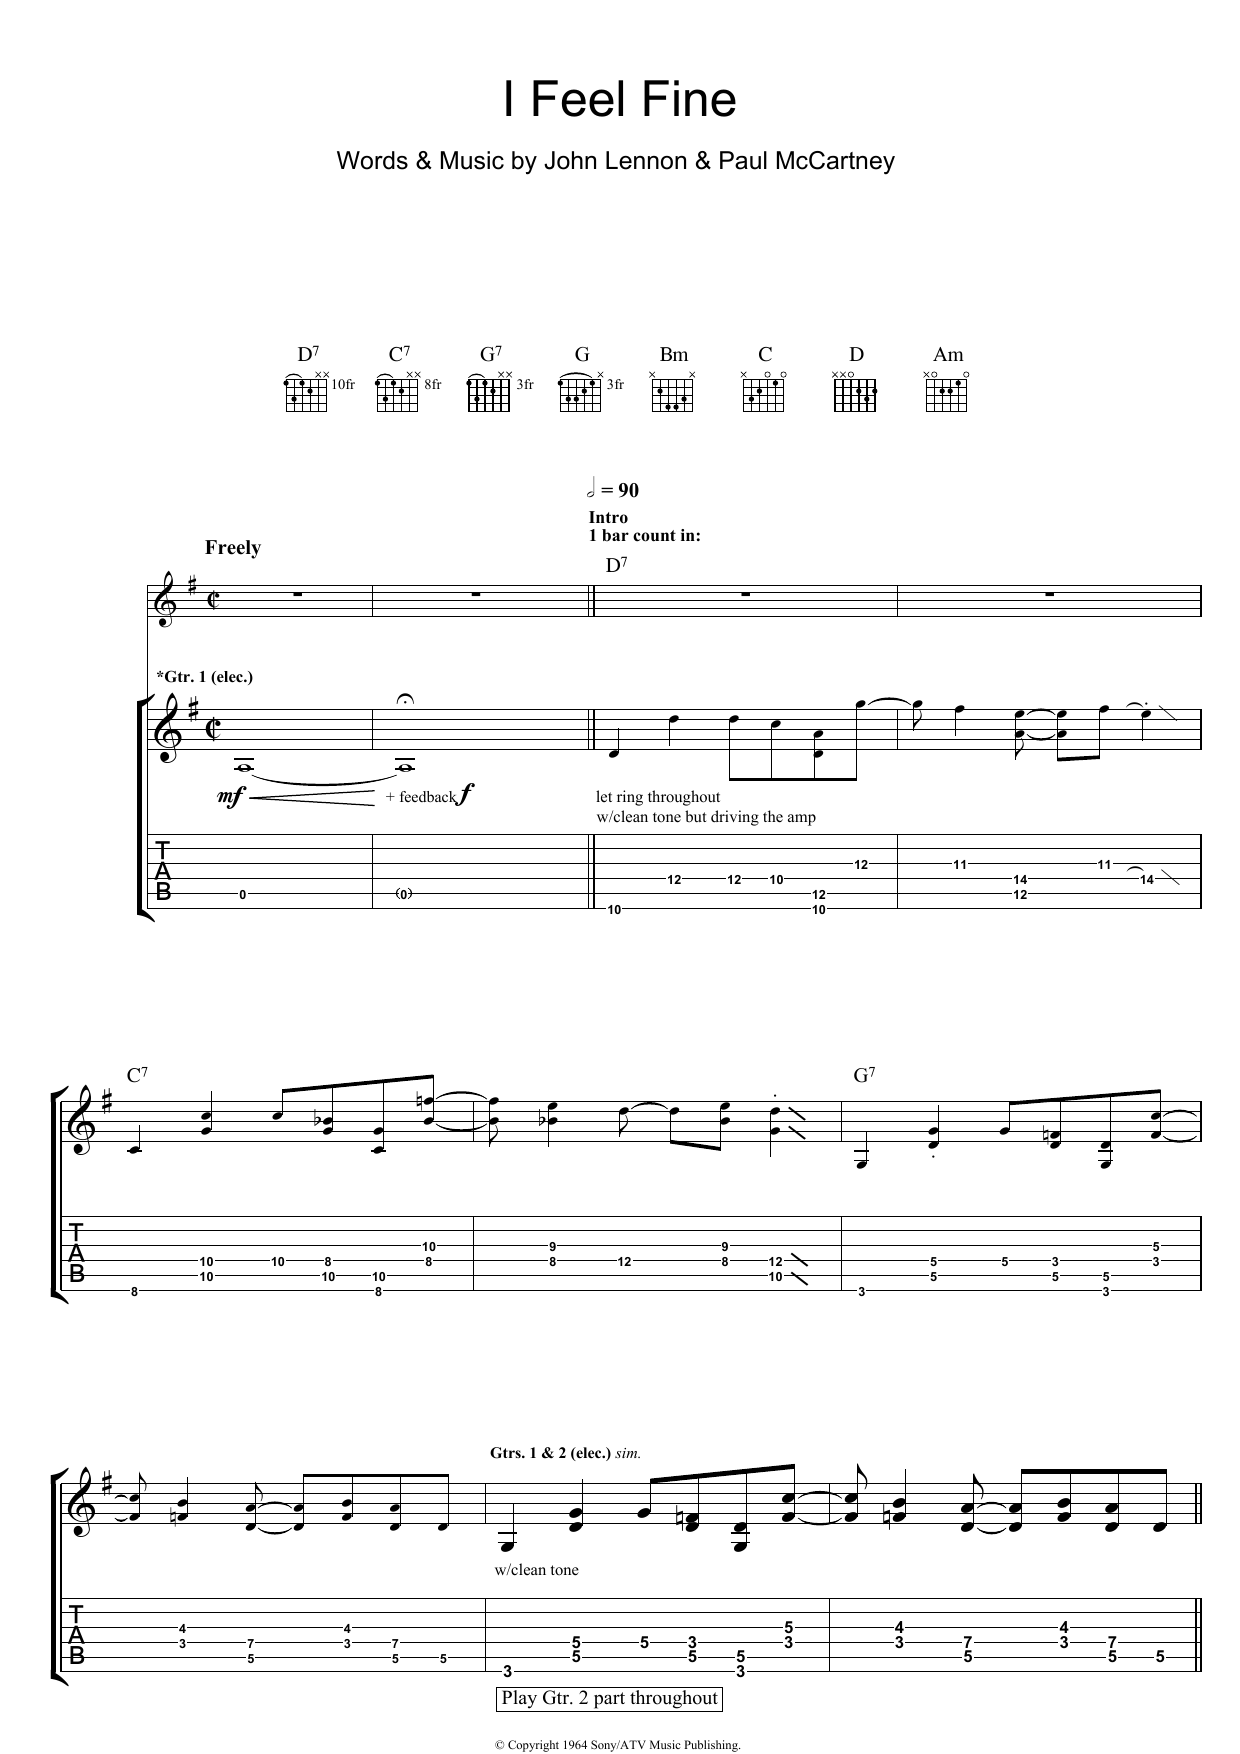 The Beatles: I Feel Fine